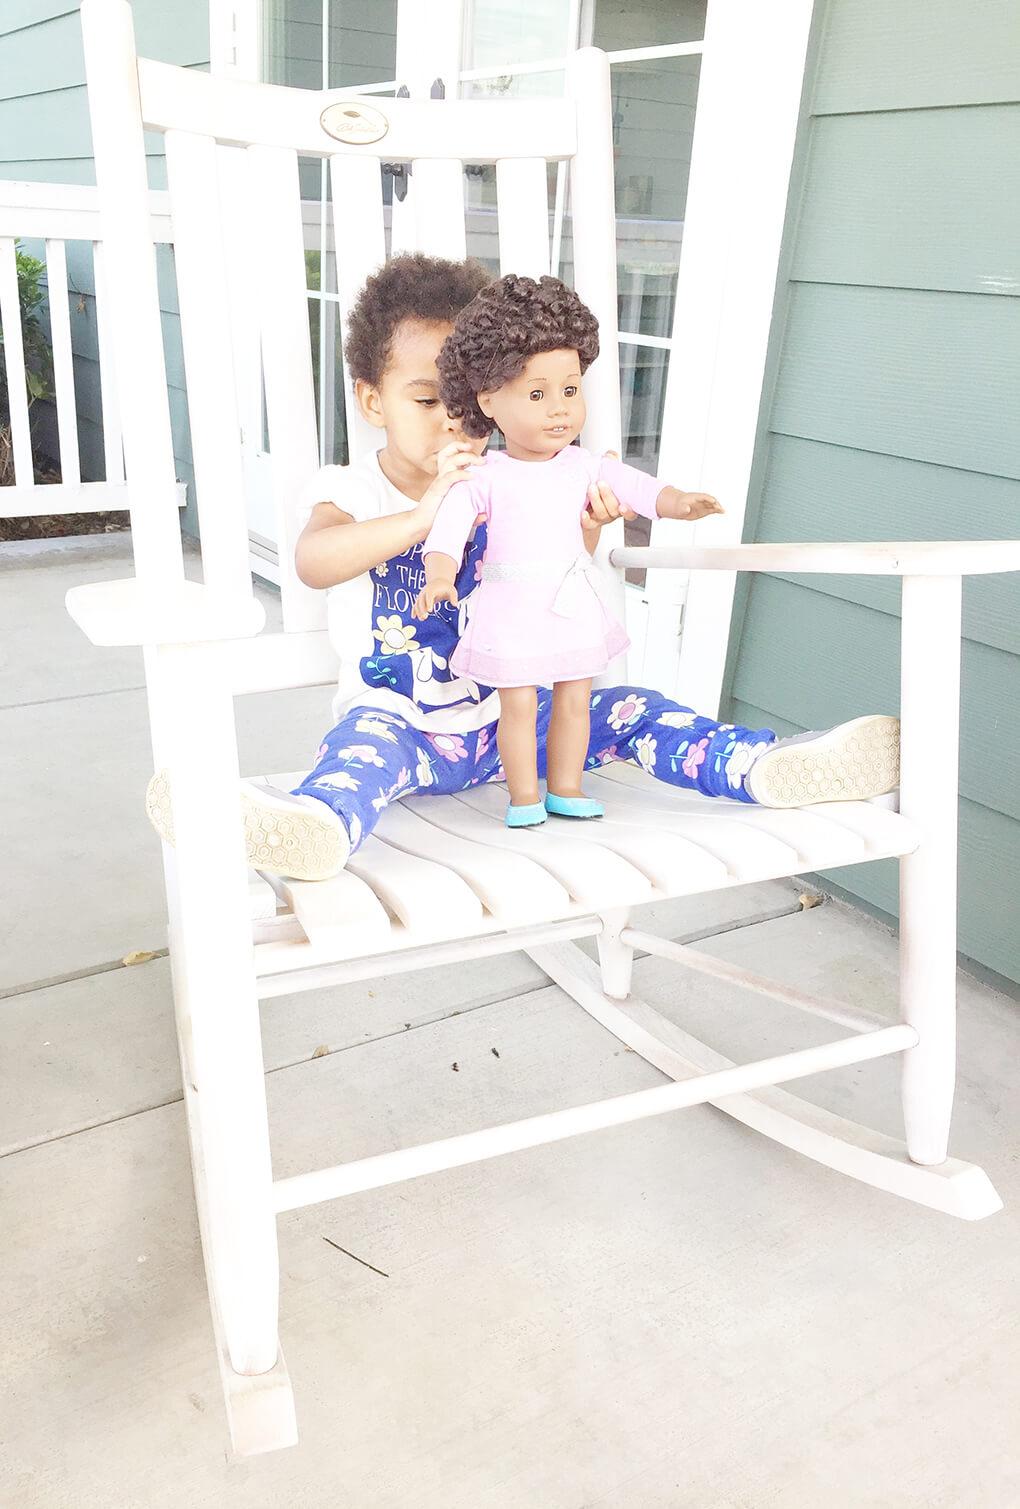 Easter is Hope TrulyMe American Girl Doll sarahkayhoffman.com Adoption Love